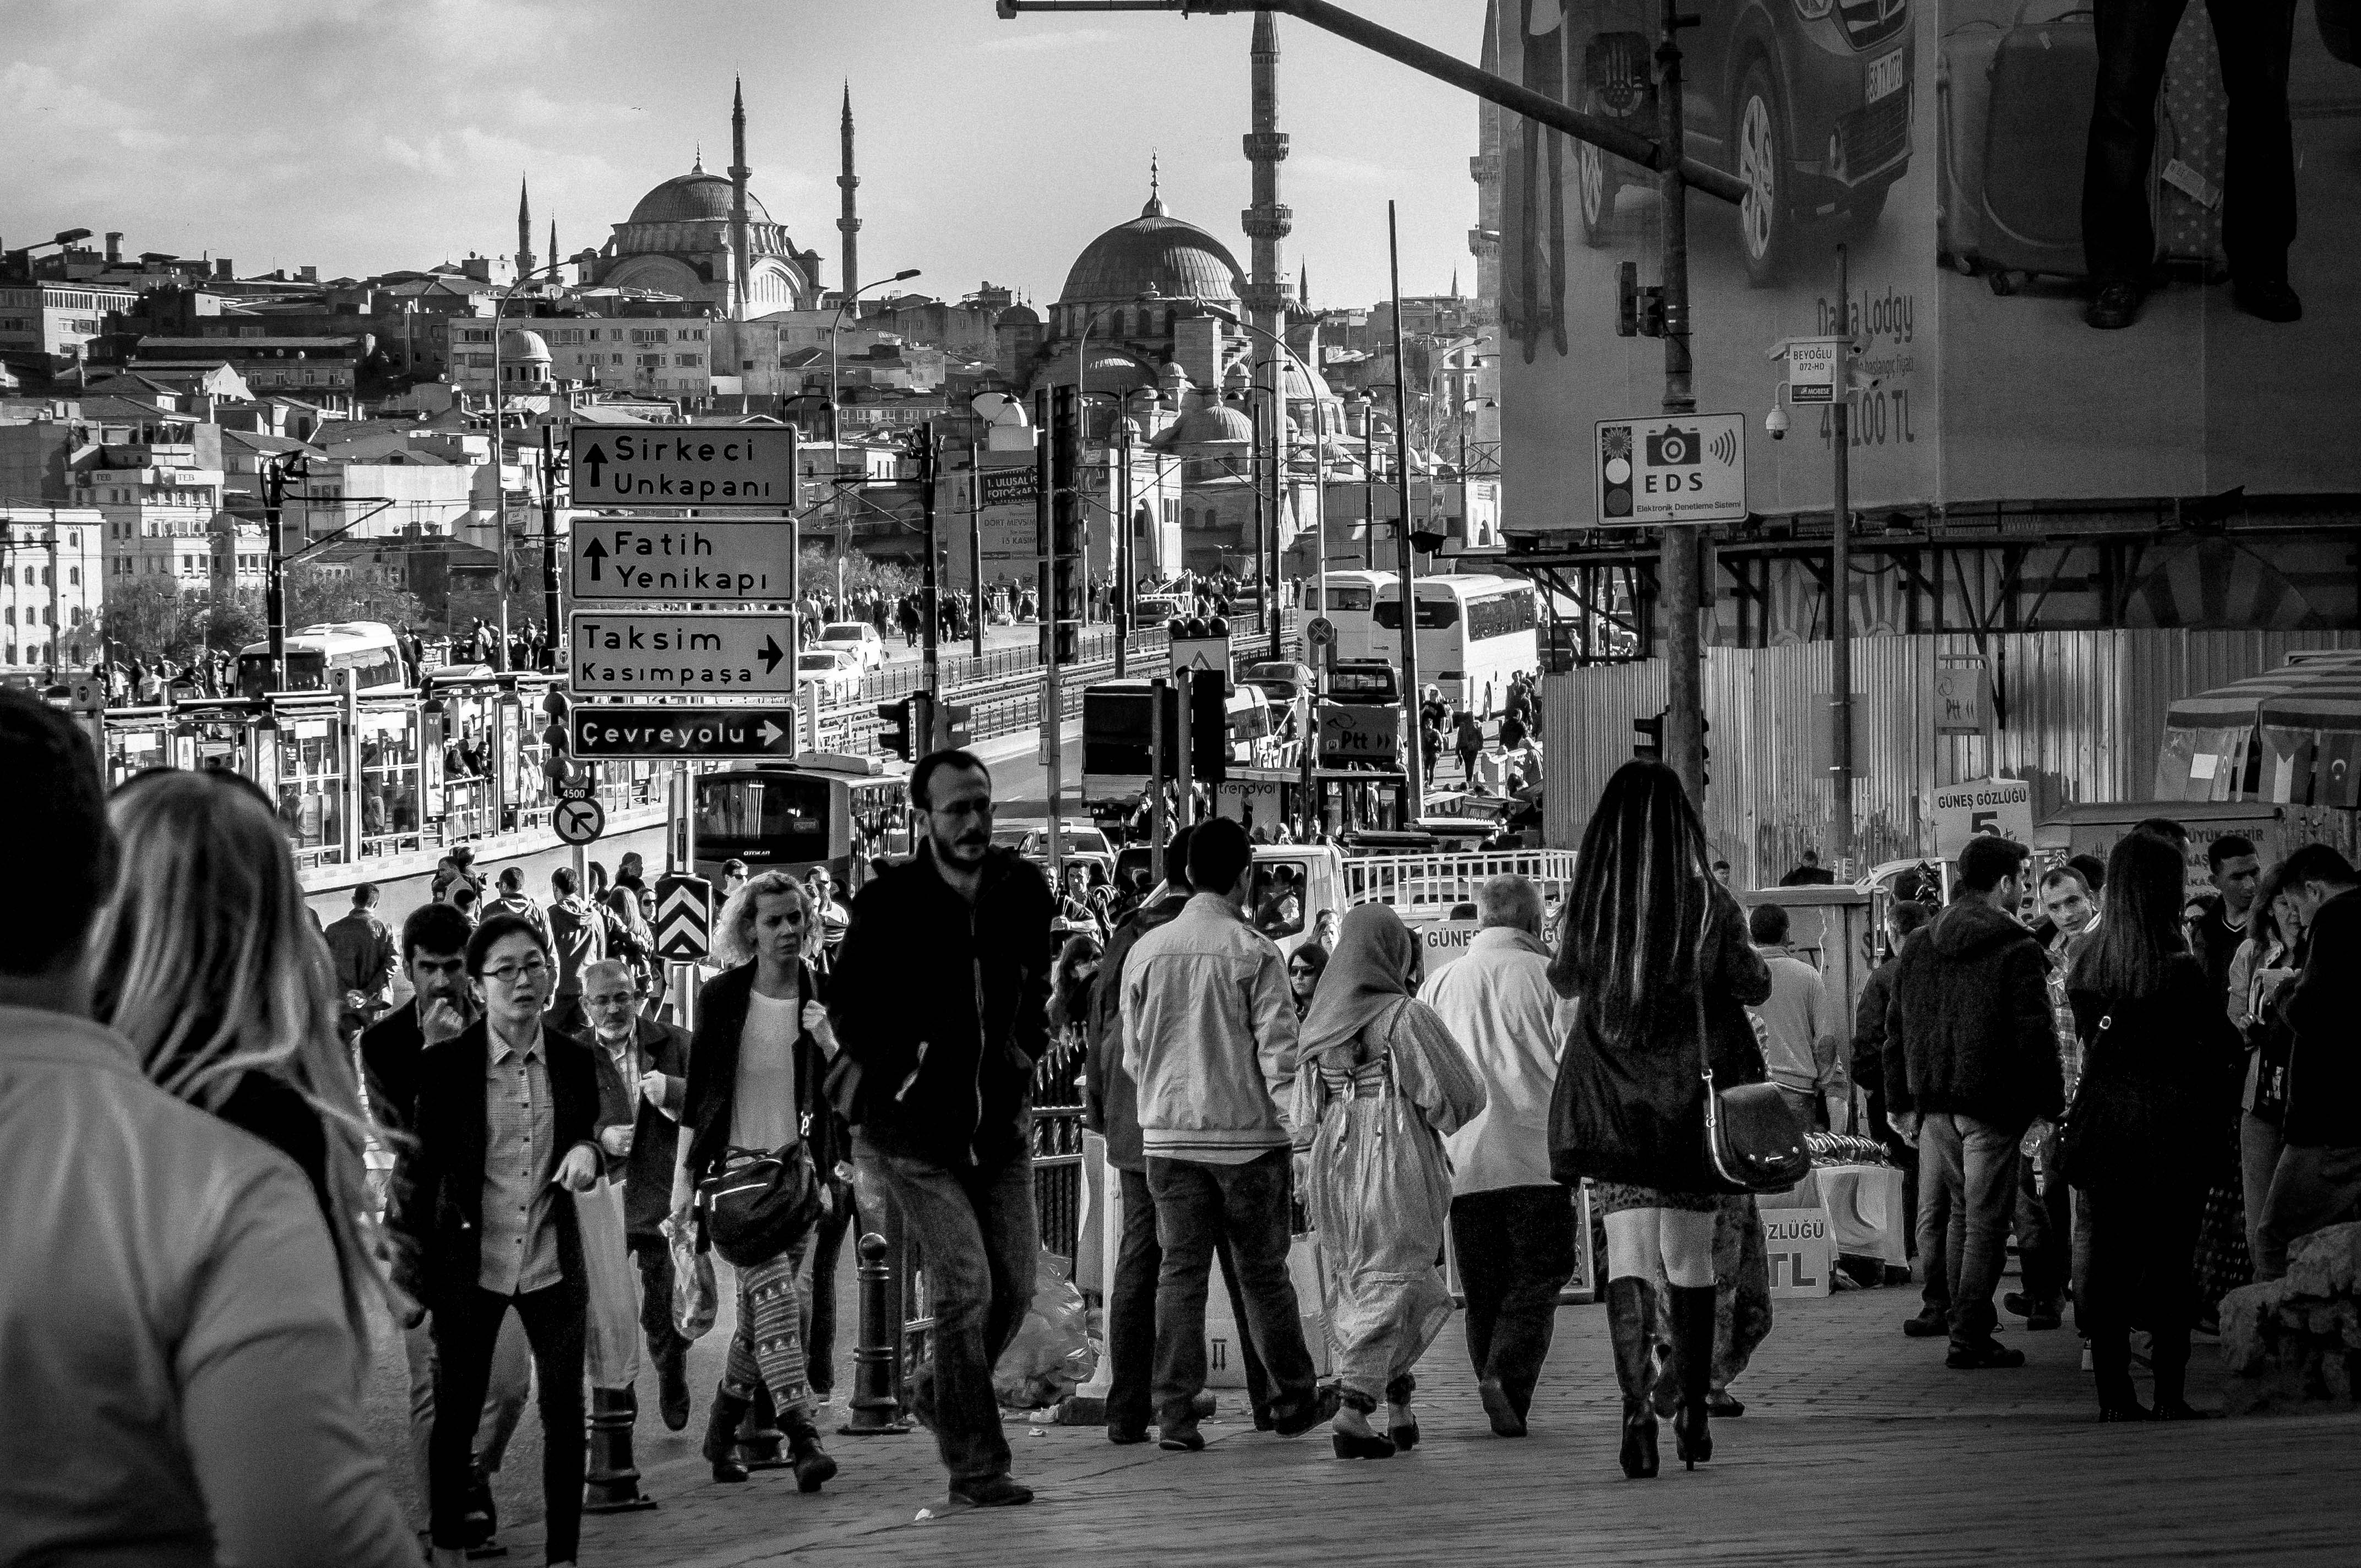 Flickr - Schegge di Istanbul, melting pot